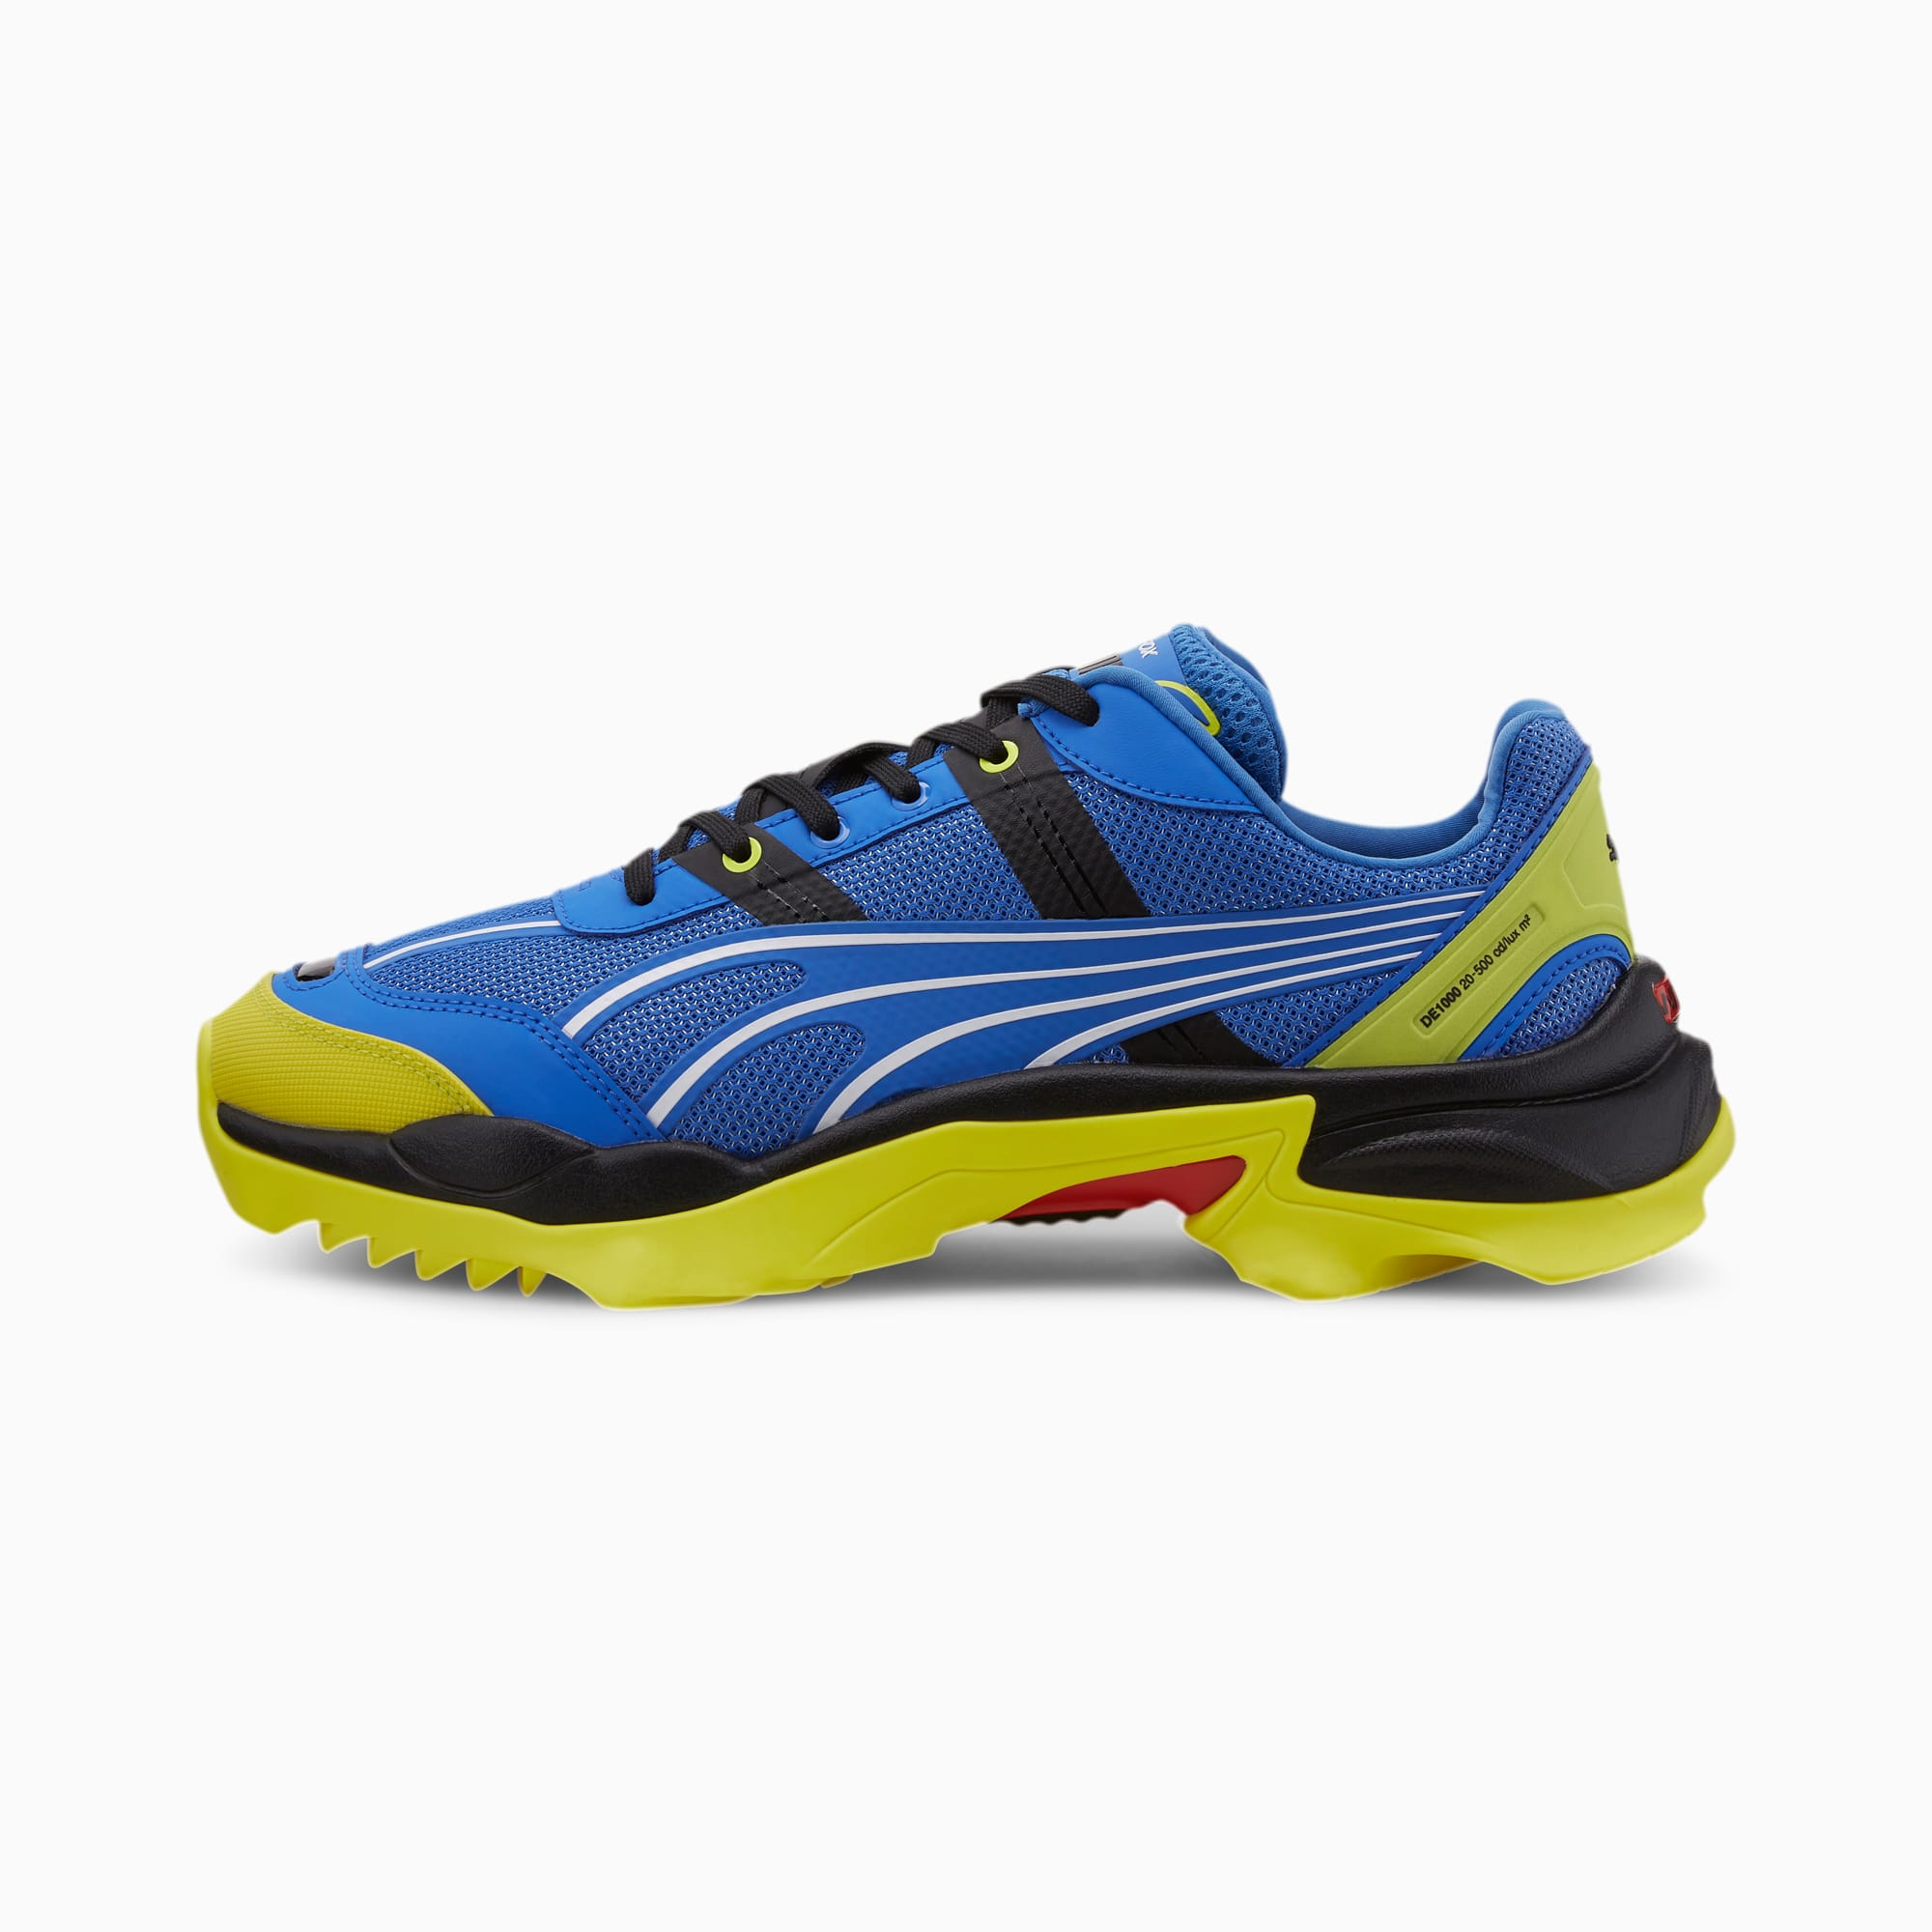 Nitefox Highway Running Shoes